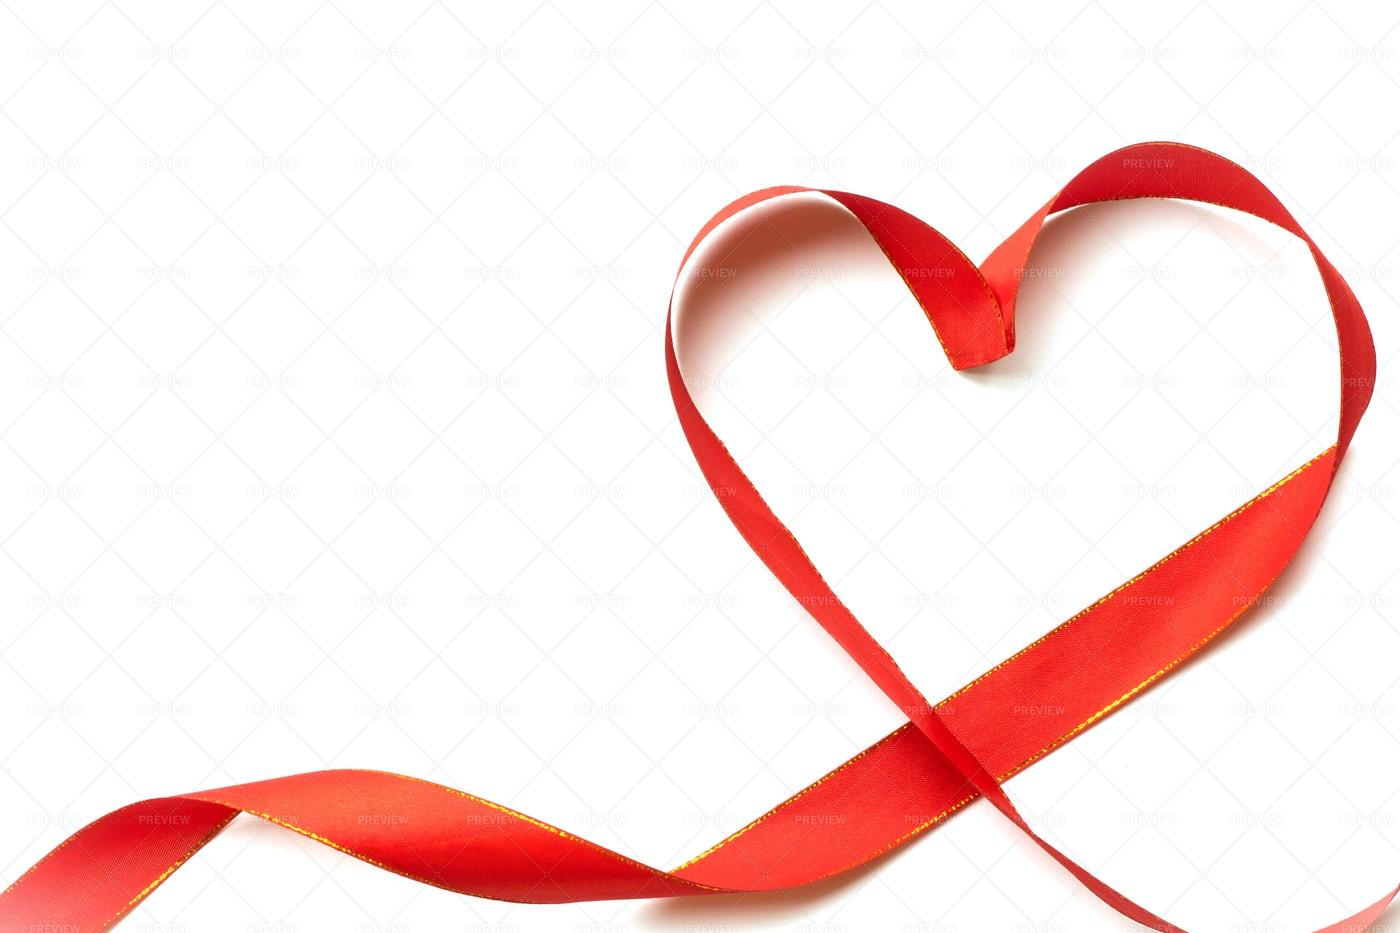 Red Ribbon Shaped As Heart: Stock Photos